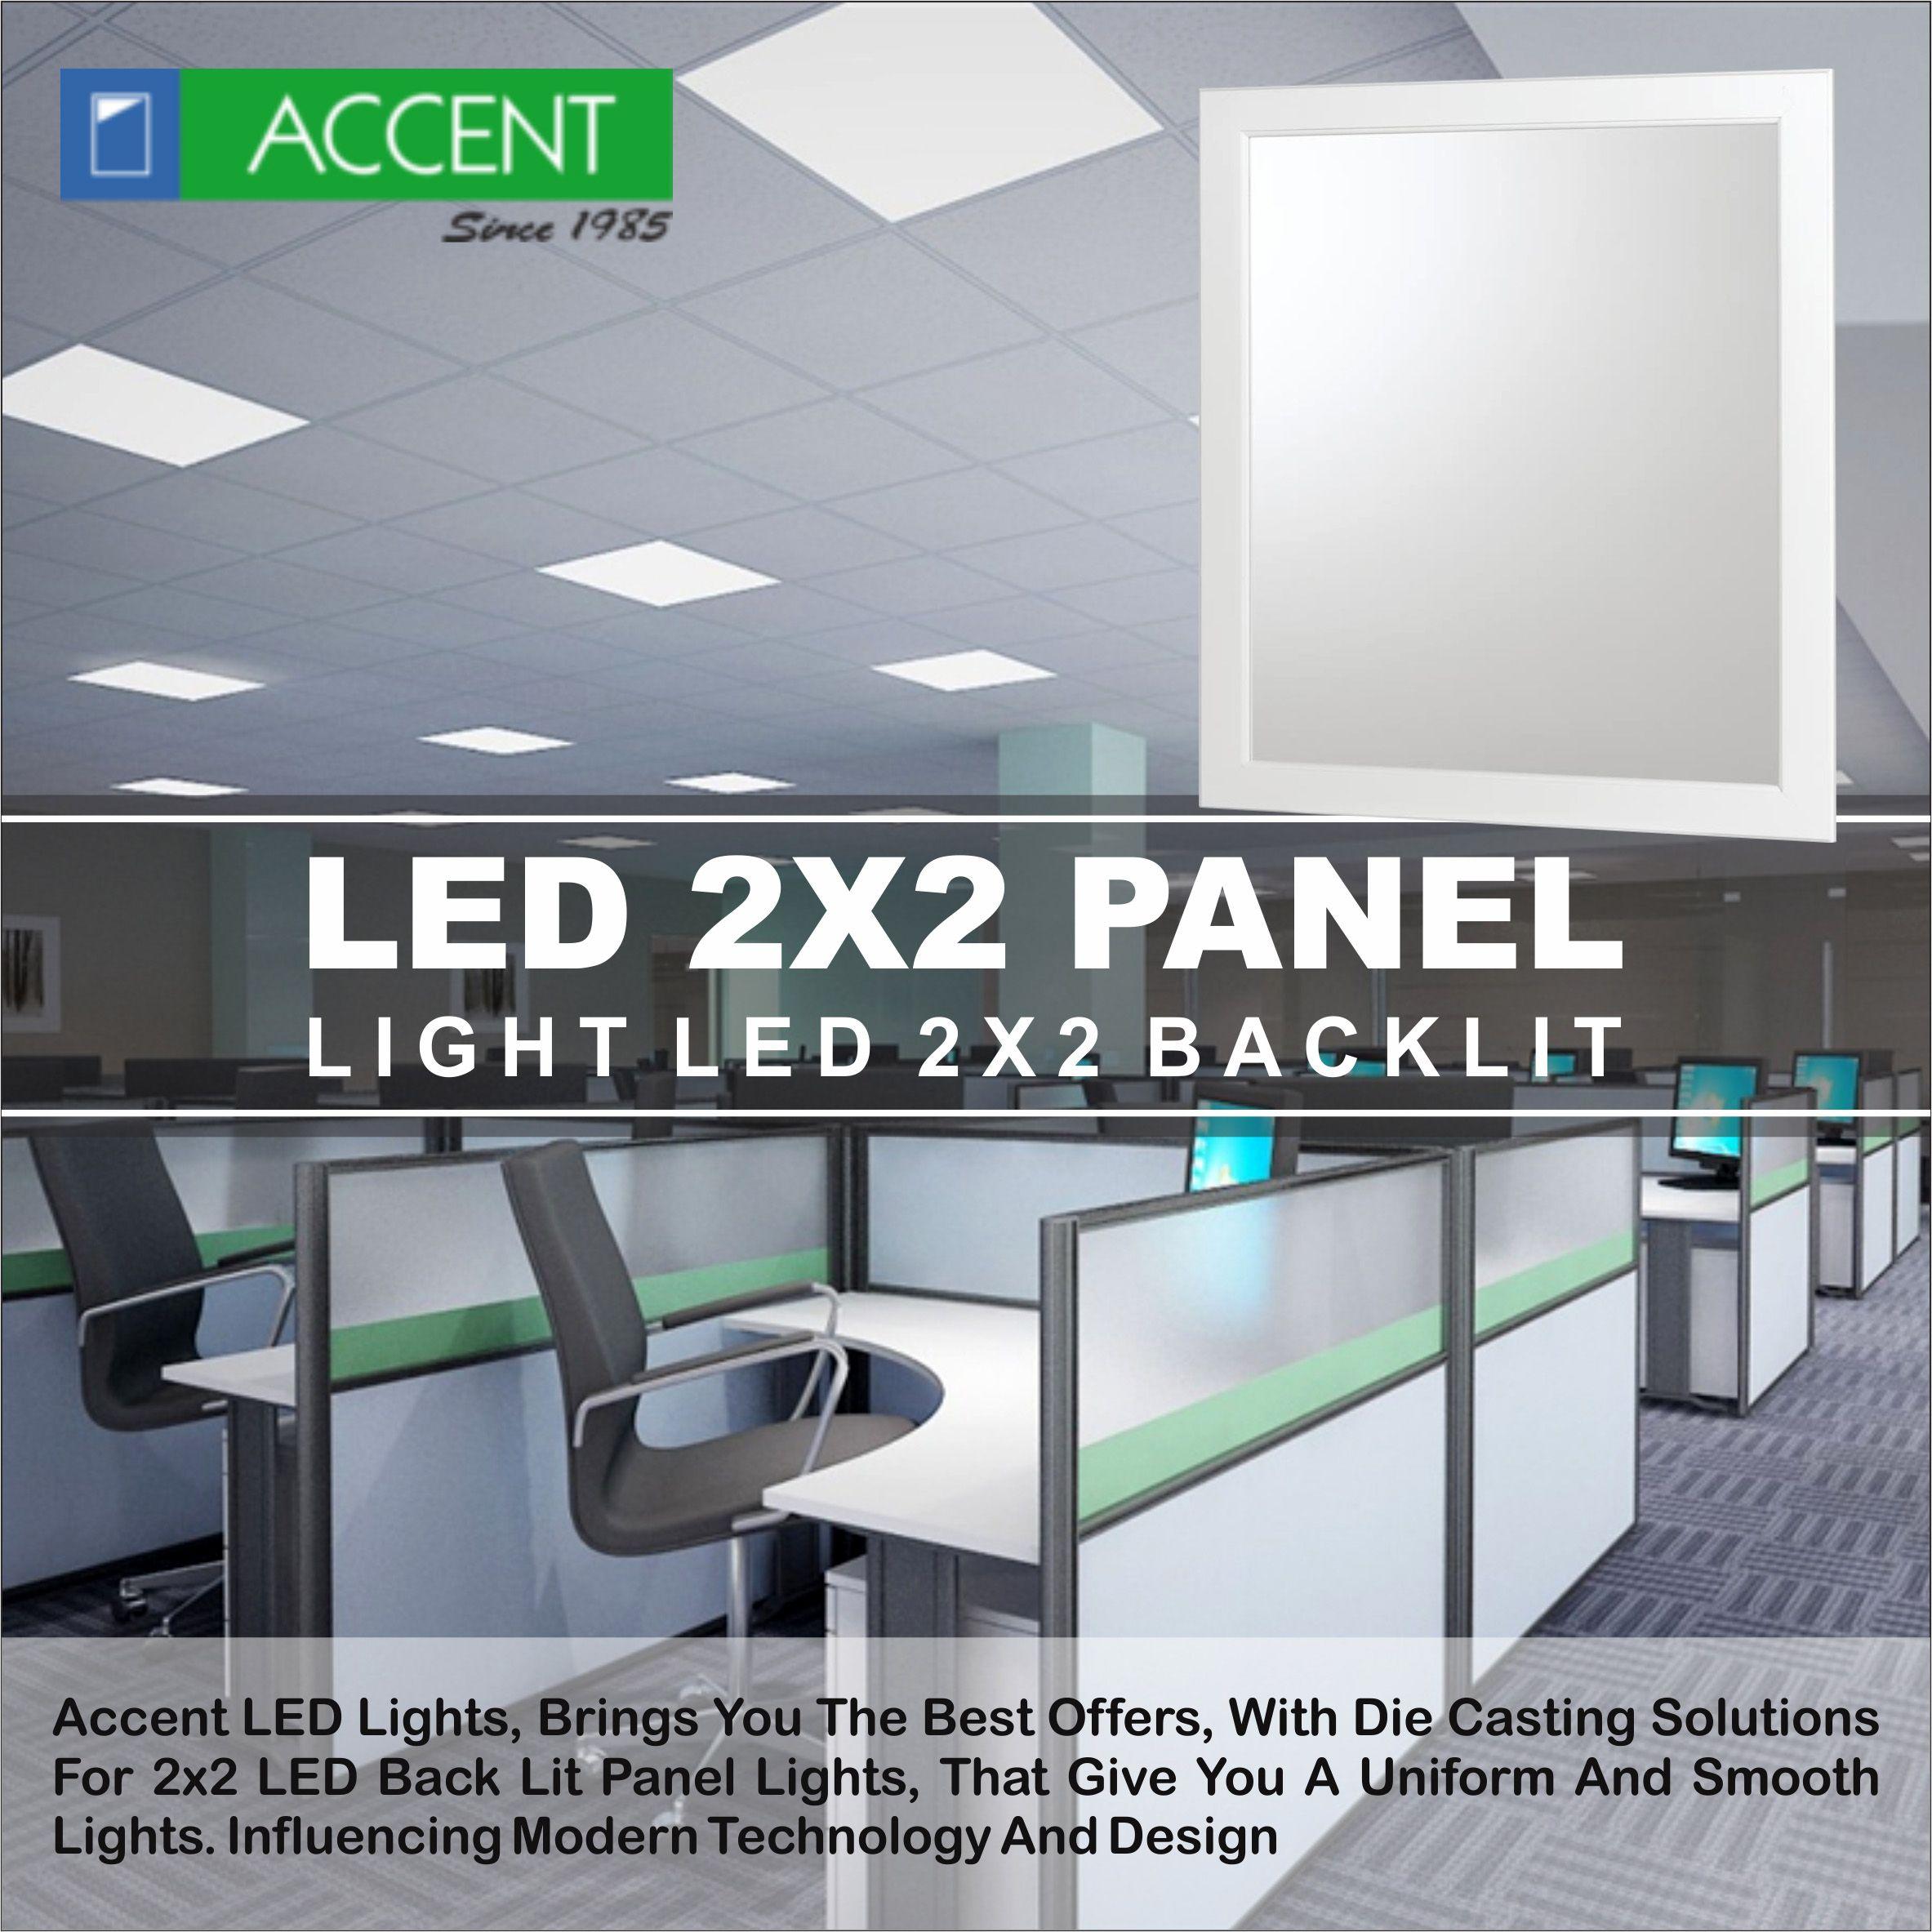 Ultra modern designed architectural LED 2x2 panel lights